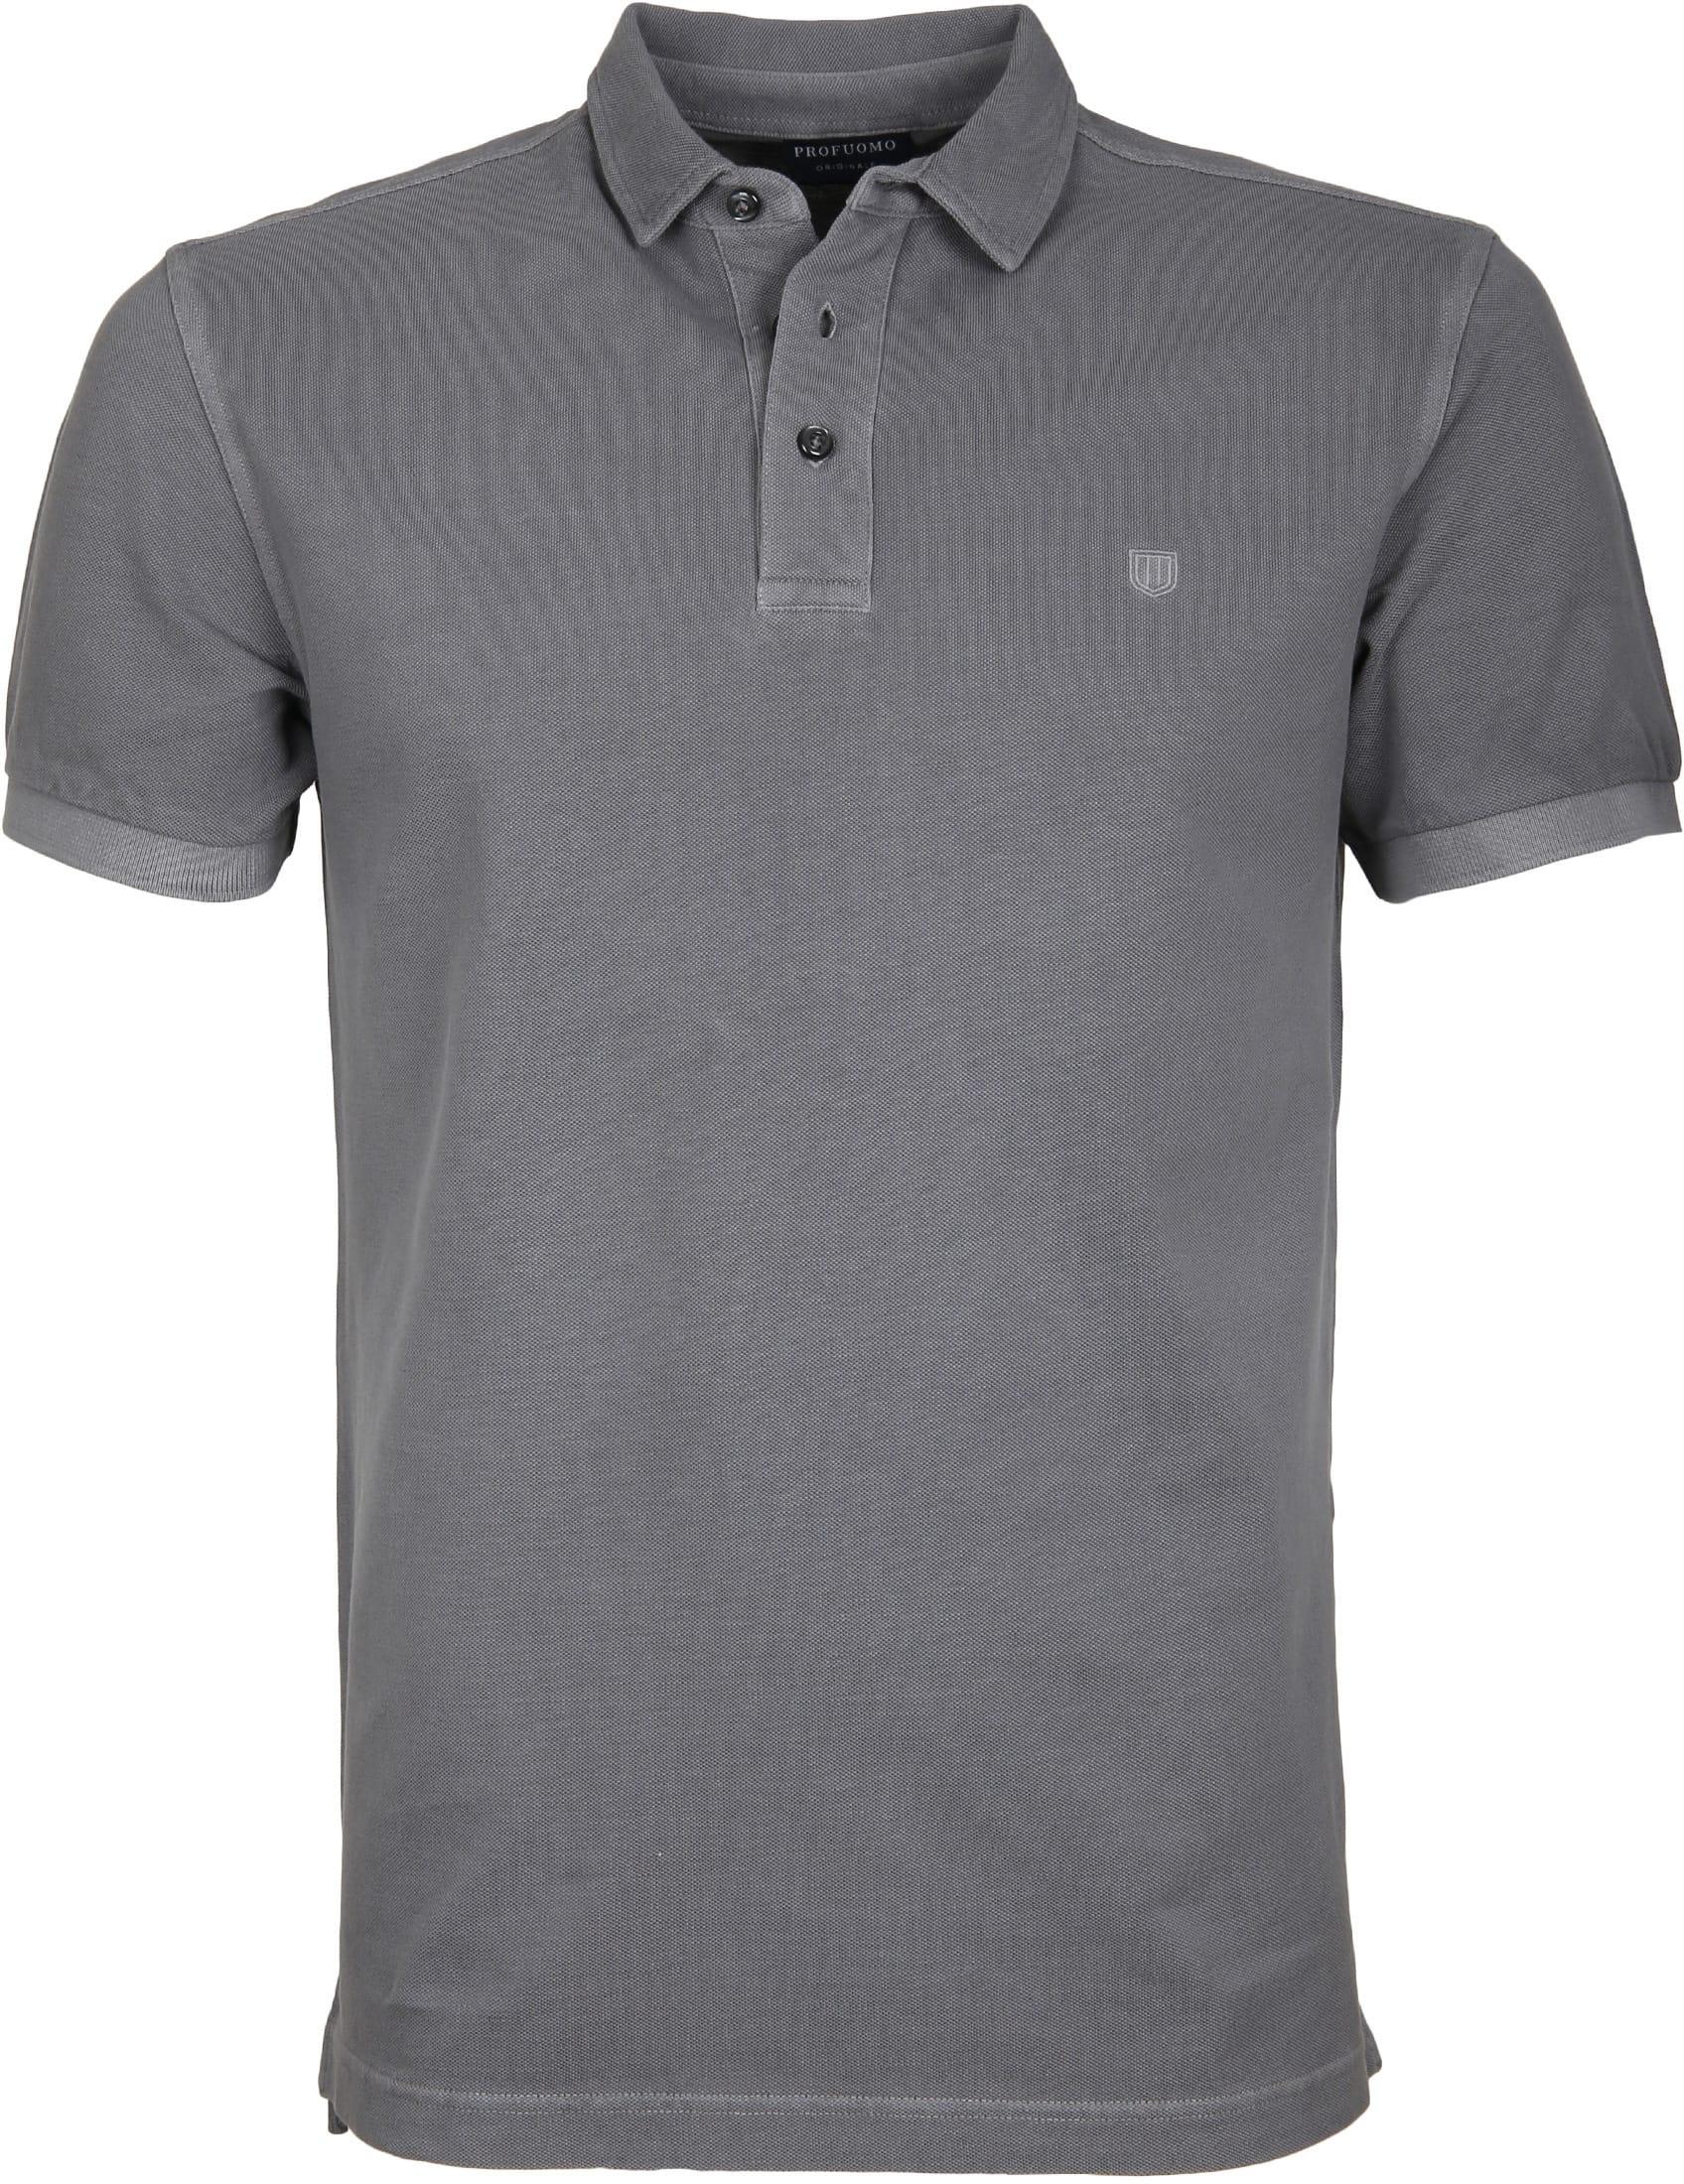 Profuomo Poloshirt Garment Grey foto 0